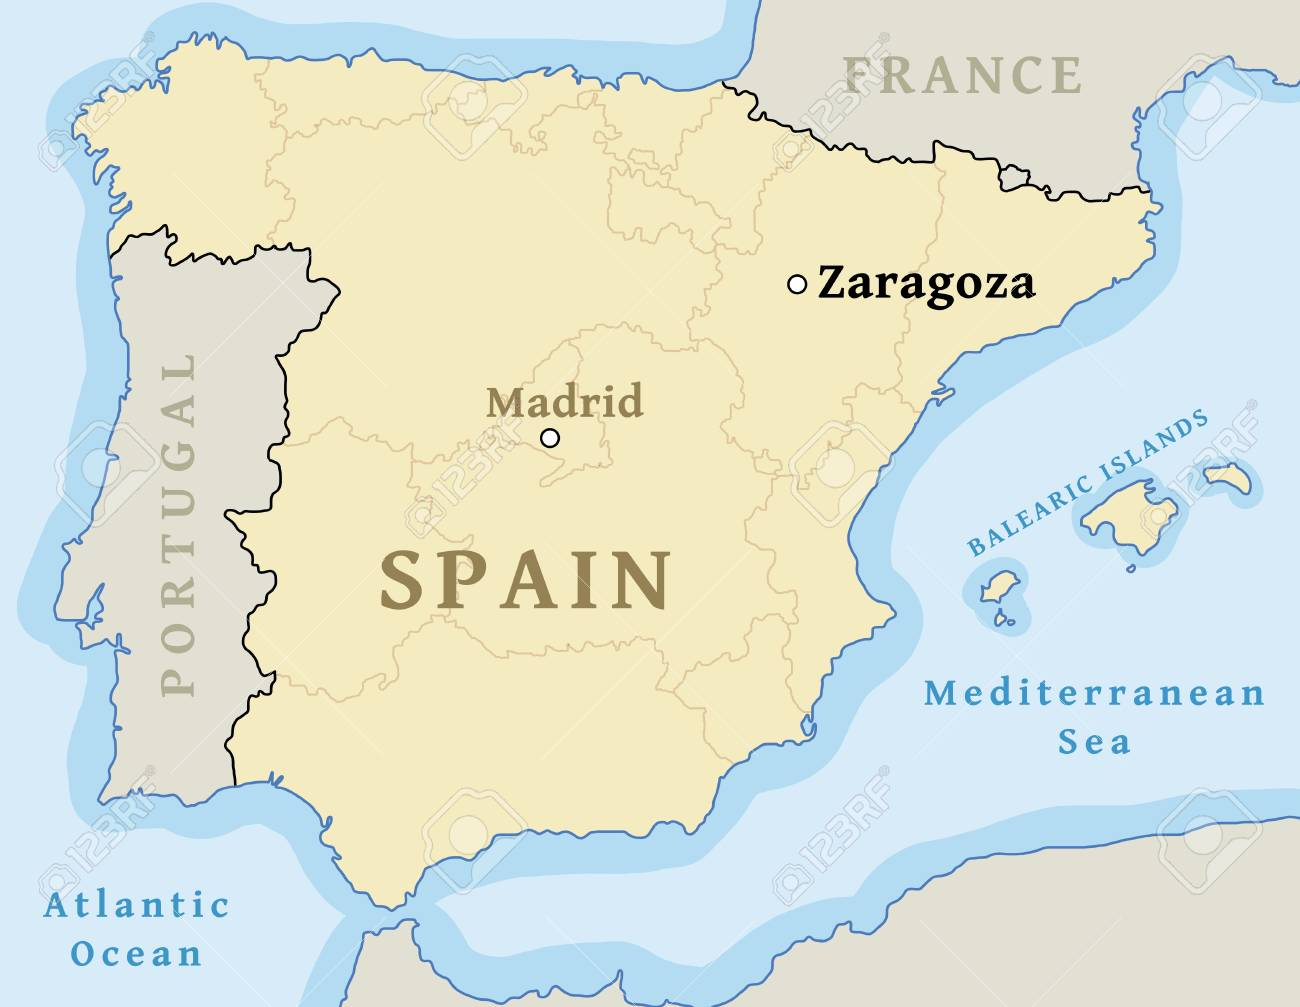 Map Of Spain Zaragoza.Zaragoza Map Location Find City On Map Of Spain Vector